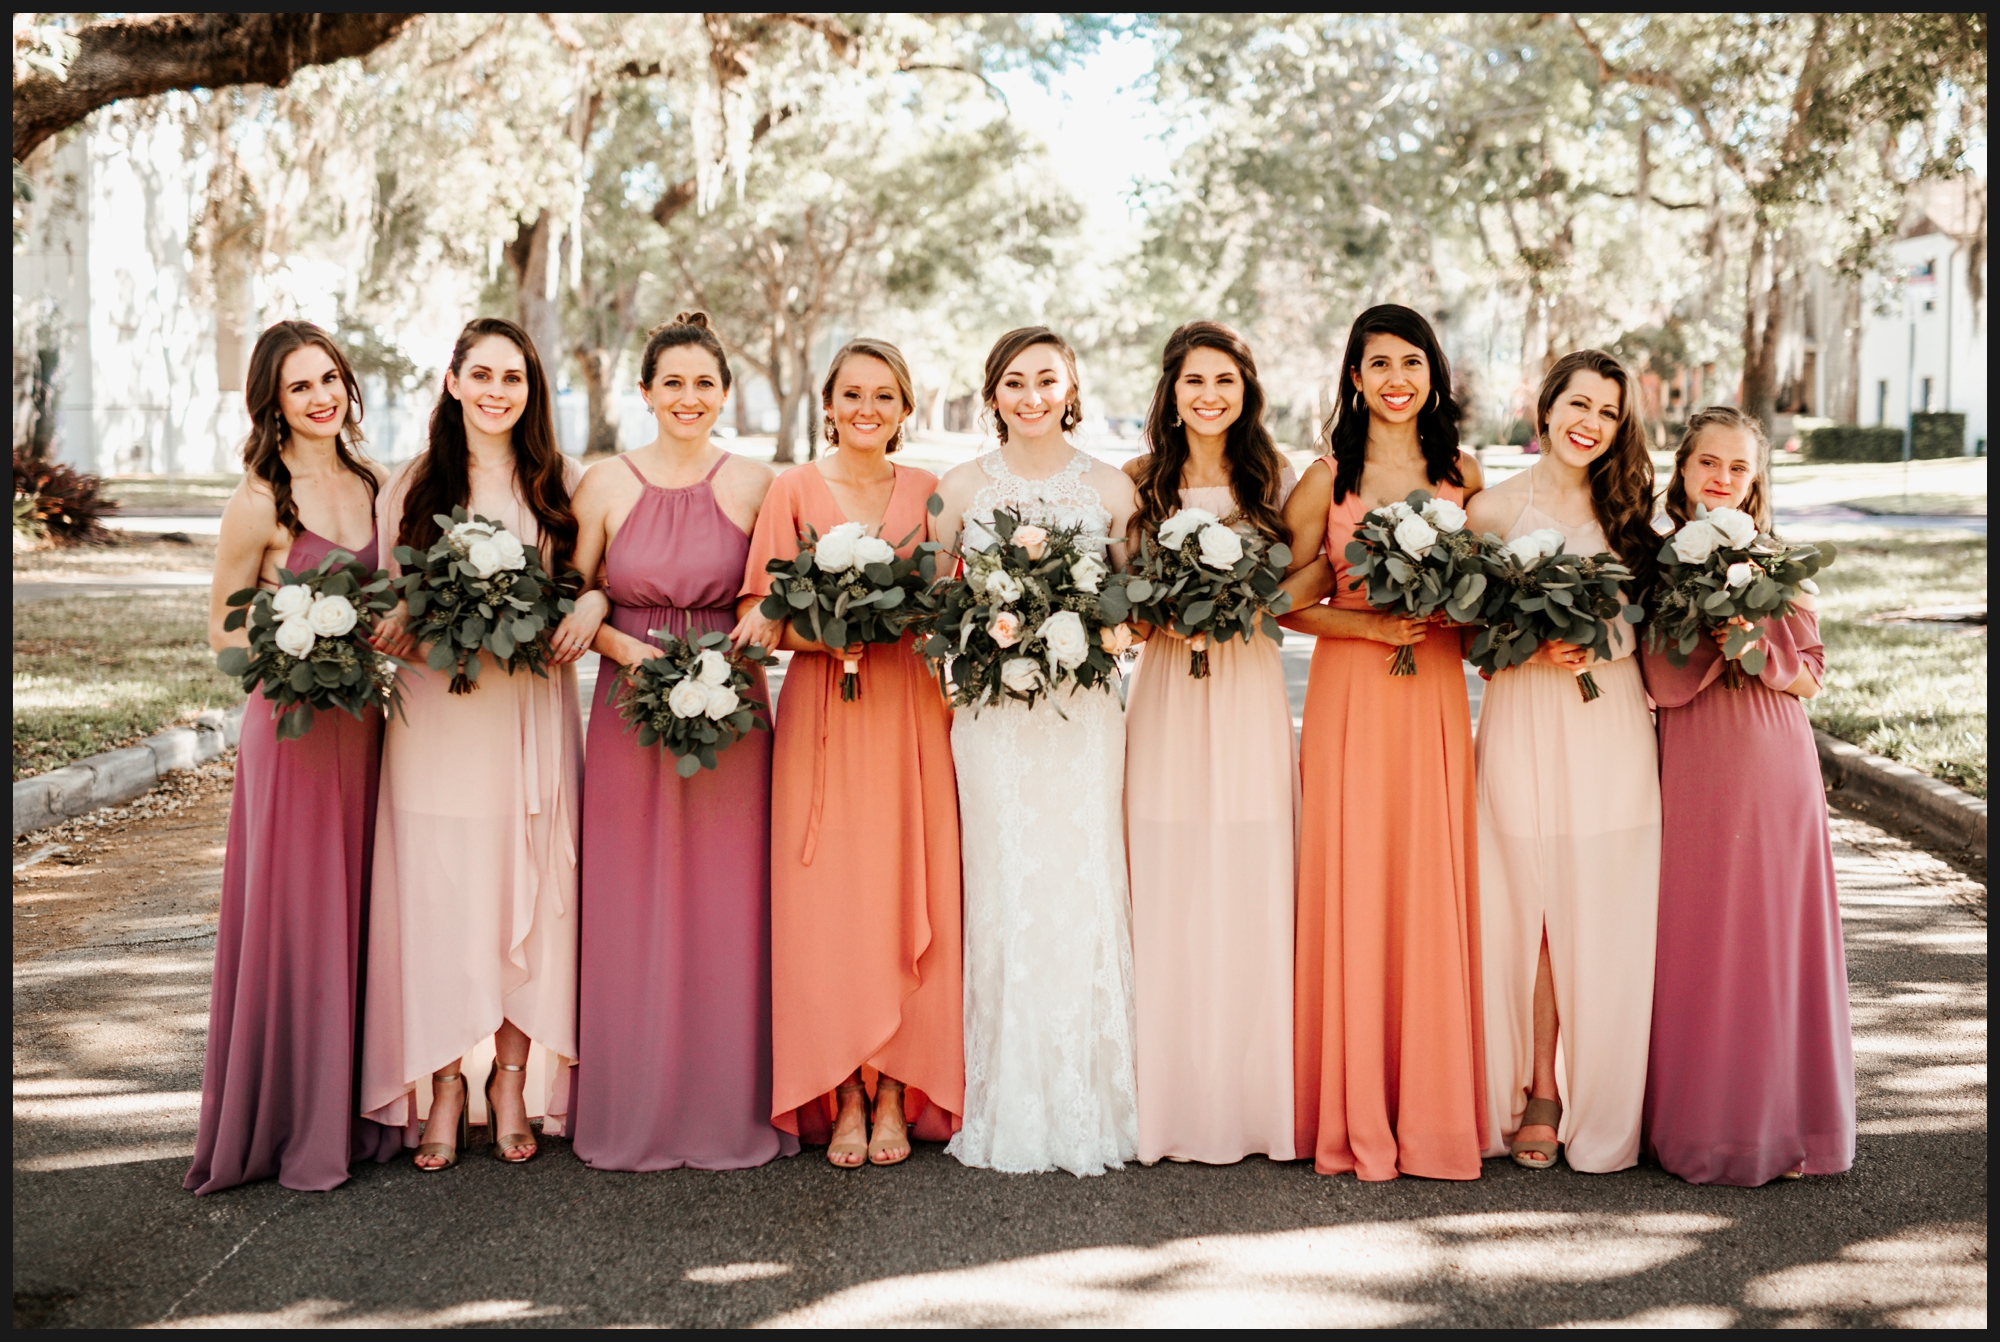 Orlando-Wedding-Photographer-destination-wedding-photographer-florida-wedding-photographer-bohemian-wedding-photographer_1756.jpg